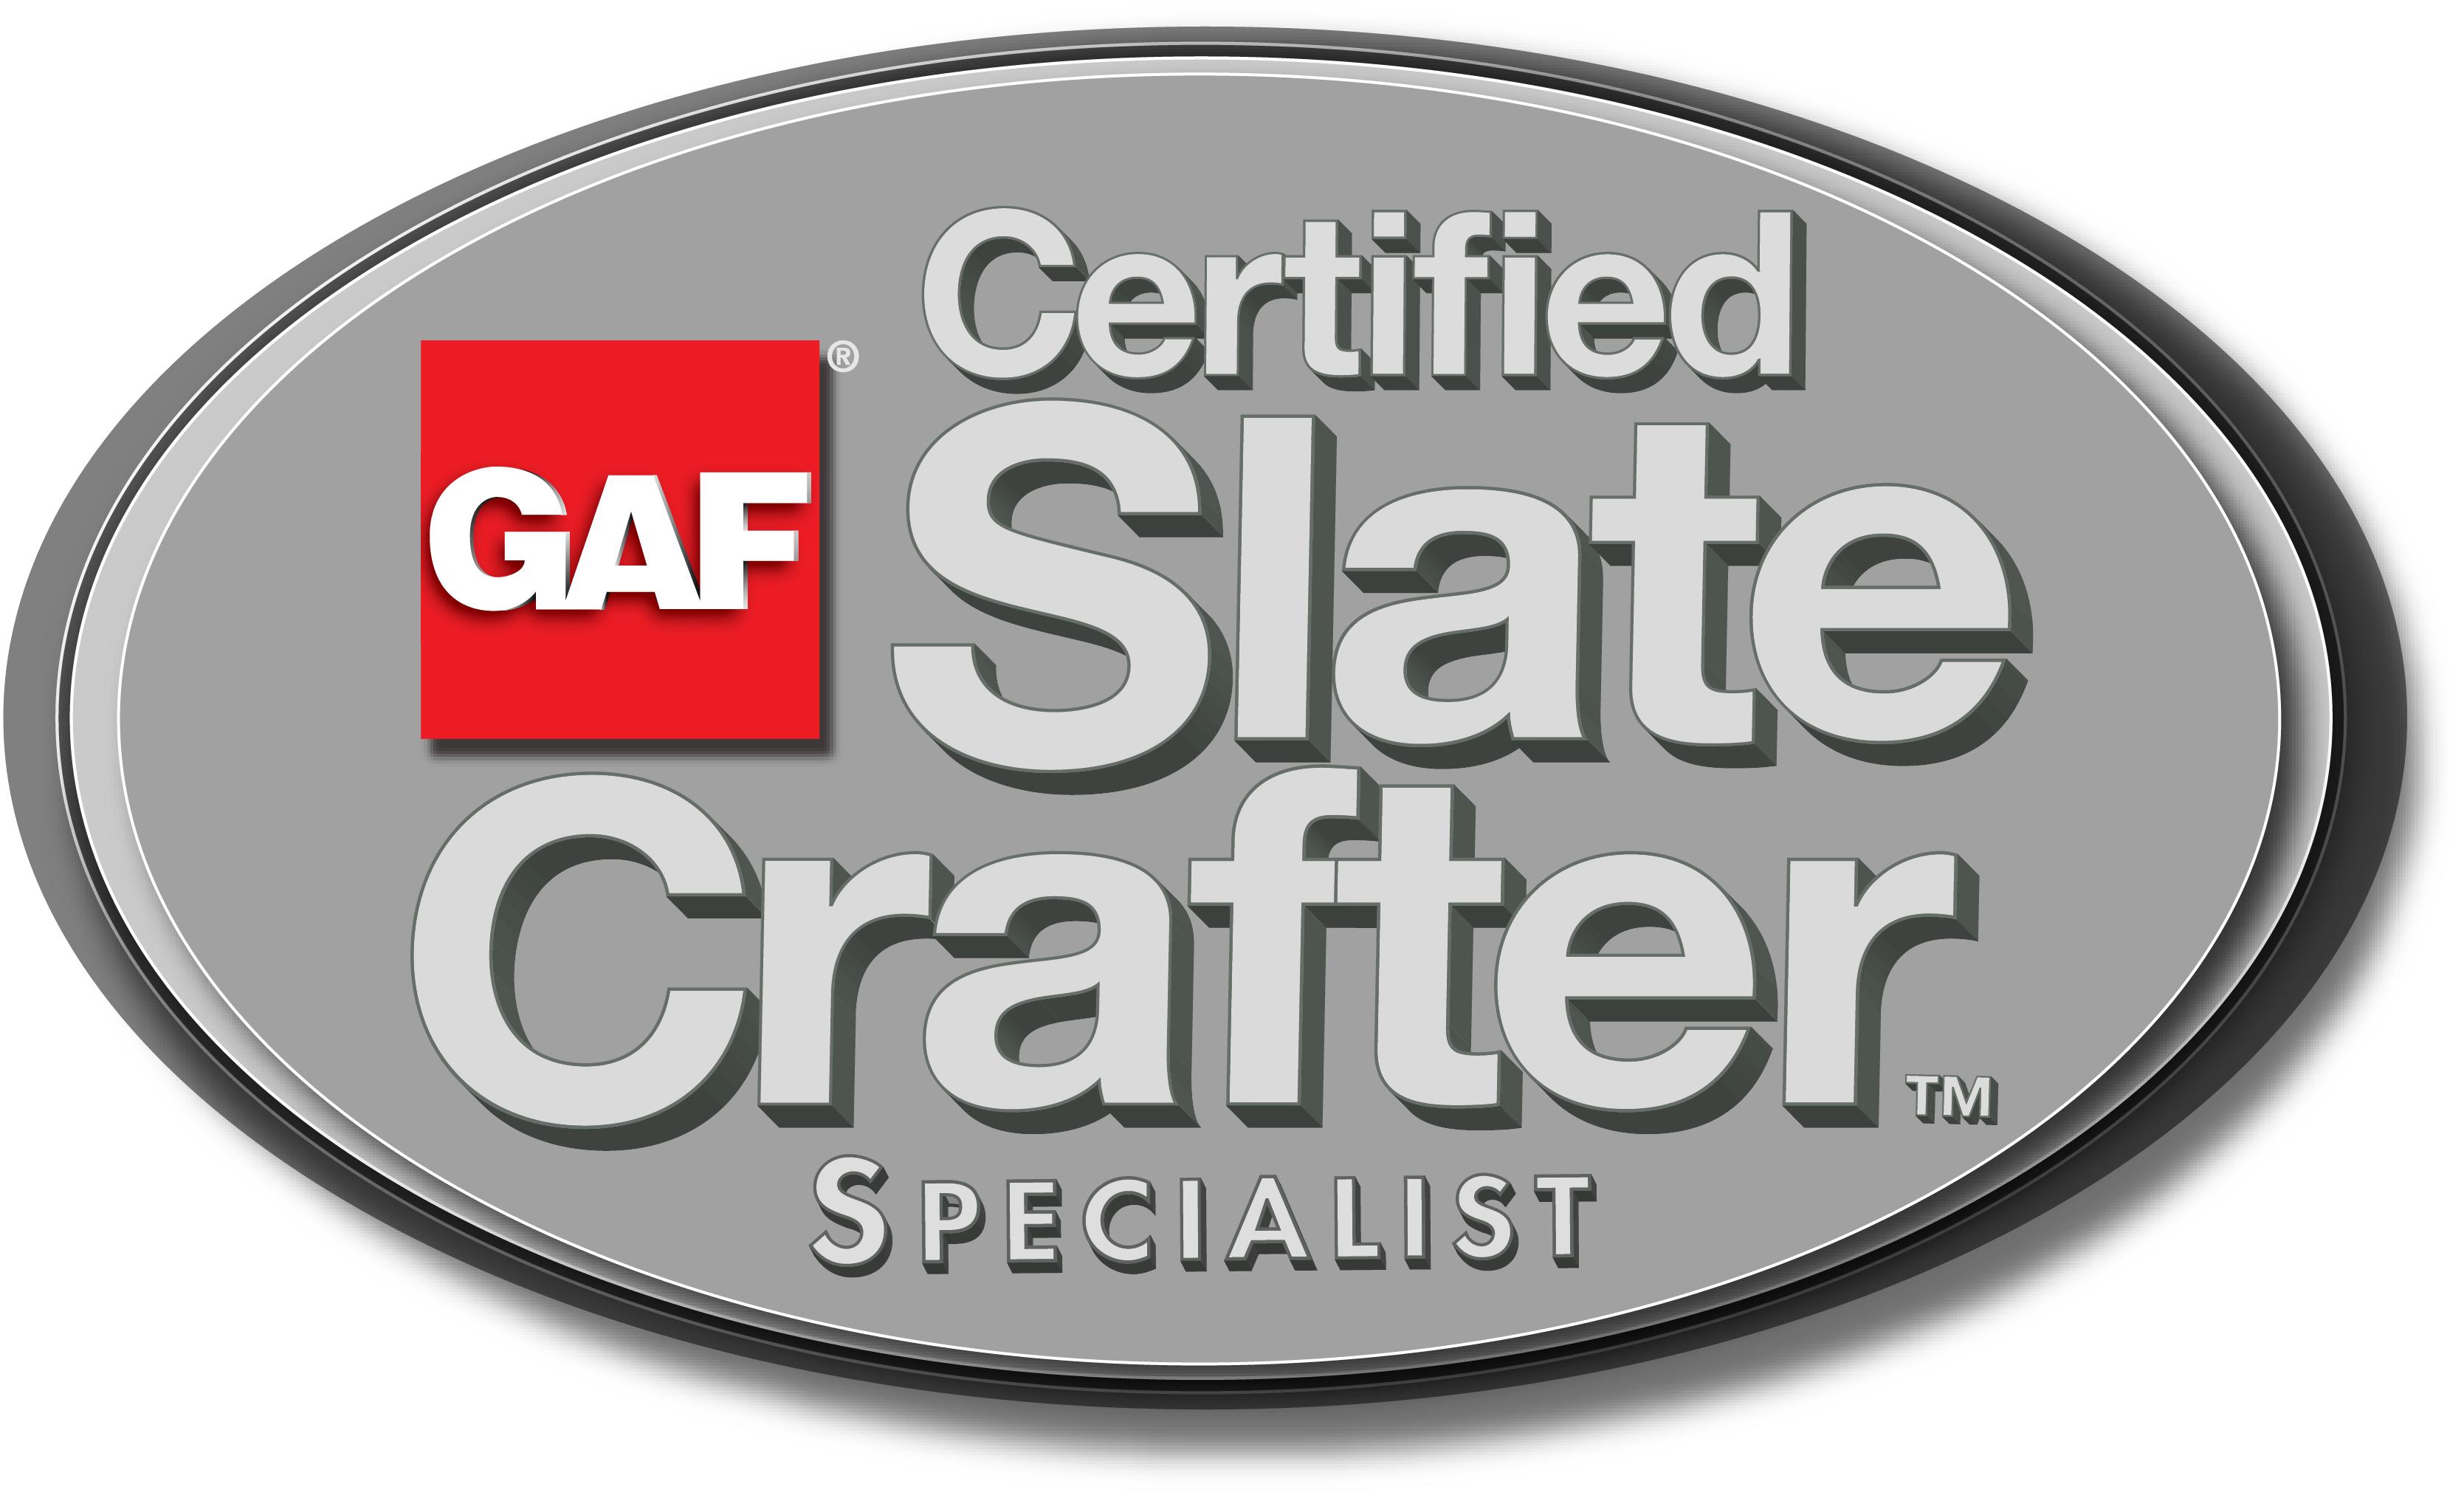 GAF Certified SlateCrafter Specialist